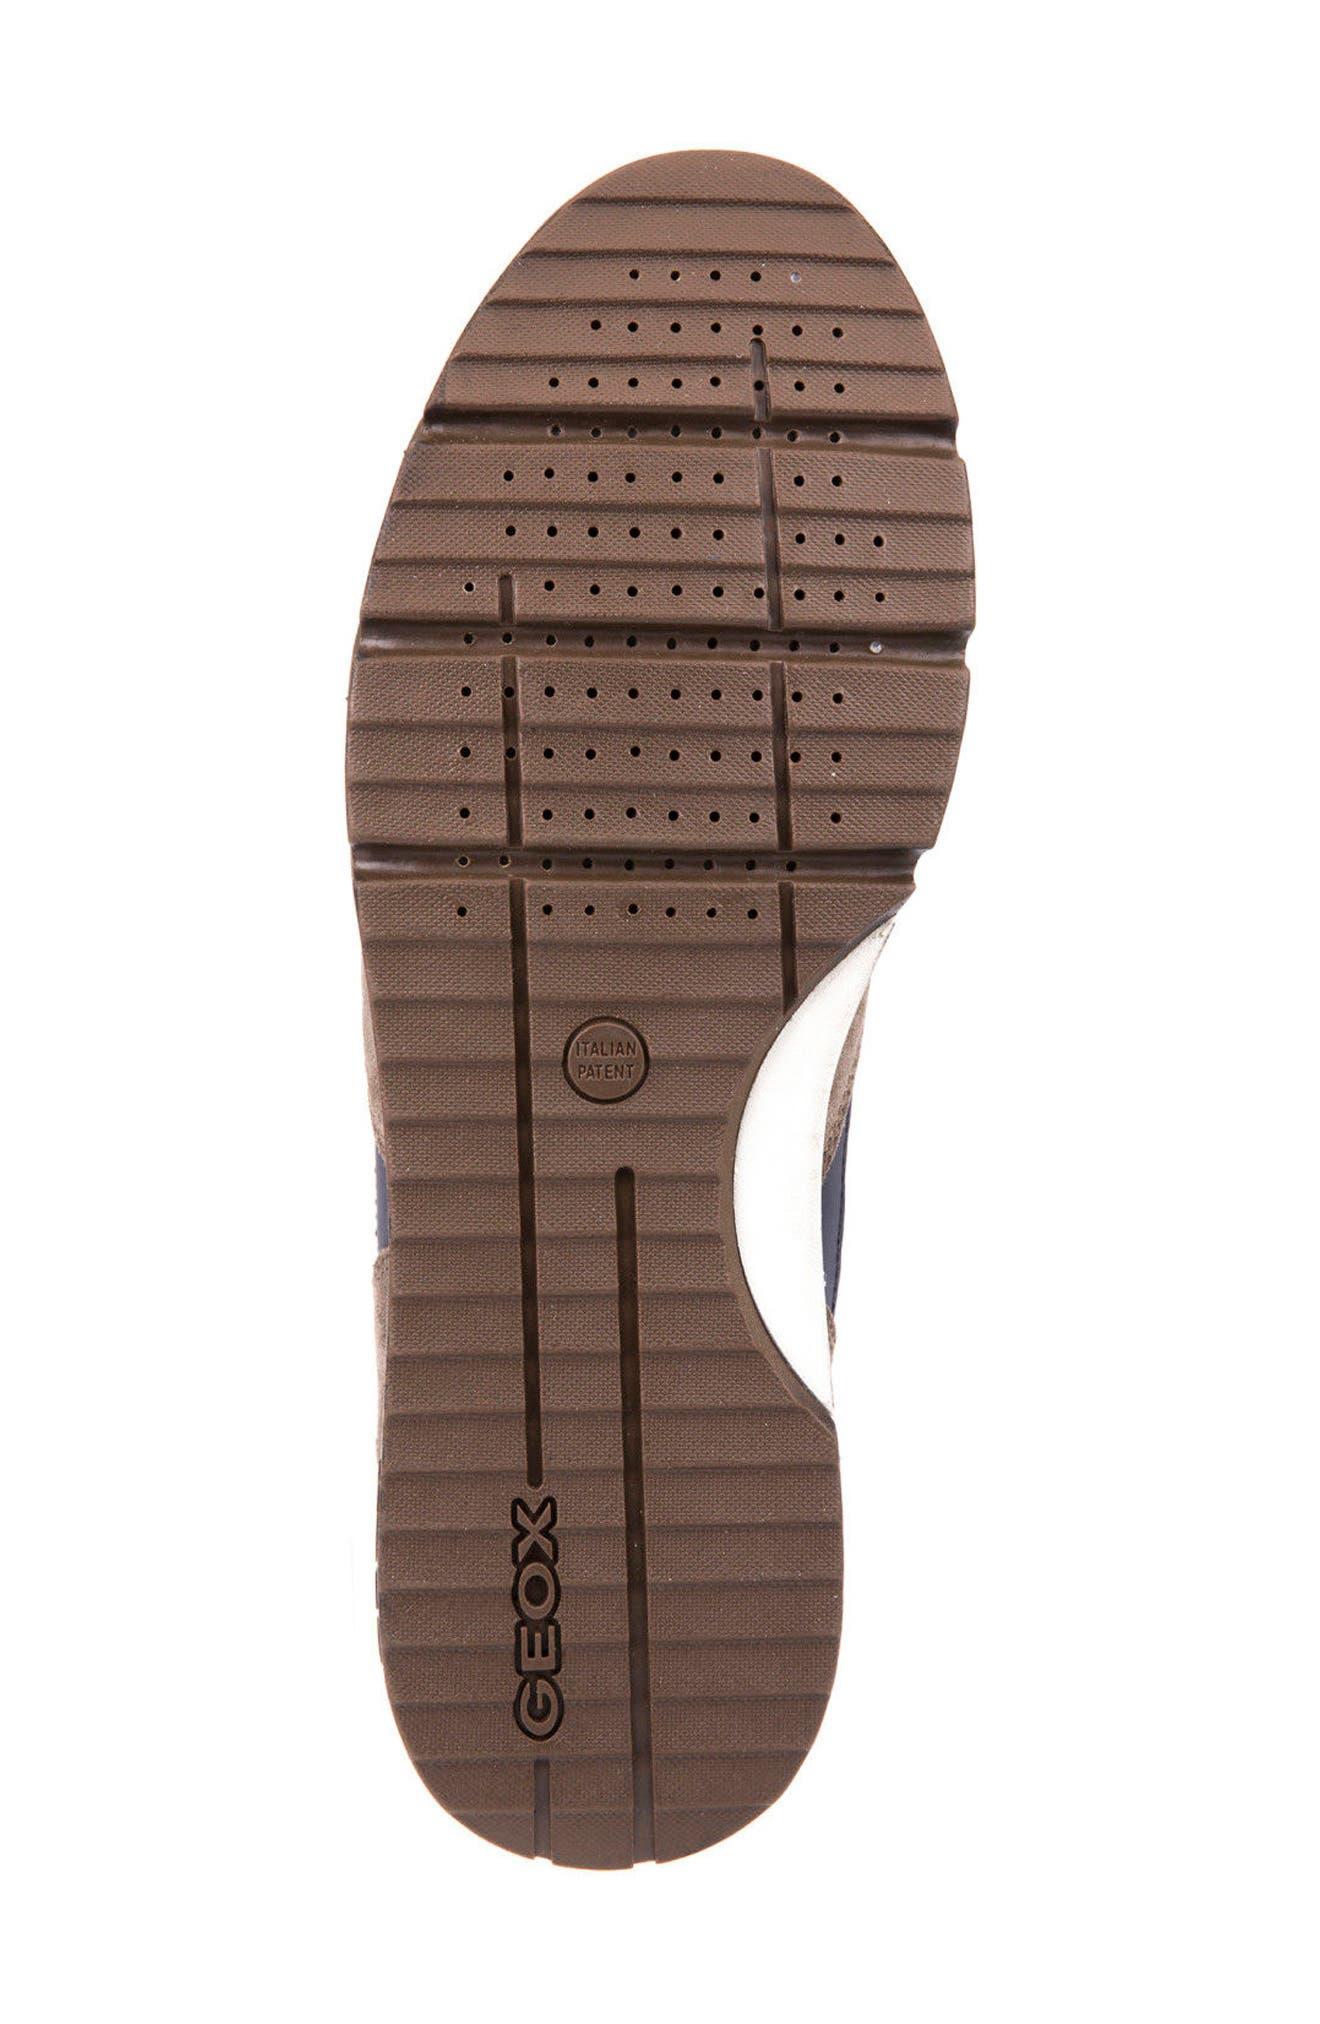 Sandro ABX Ambphibiox Waterproof Sneaker,                             Alternate thumbnail 6, color,                             Taupe